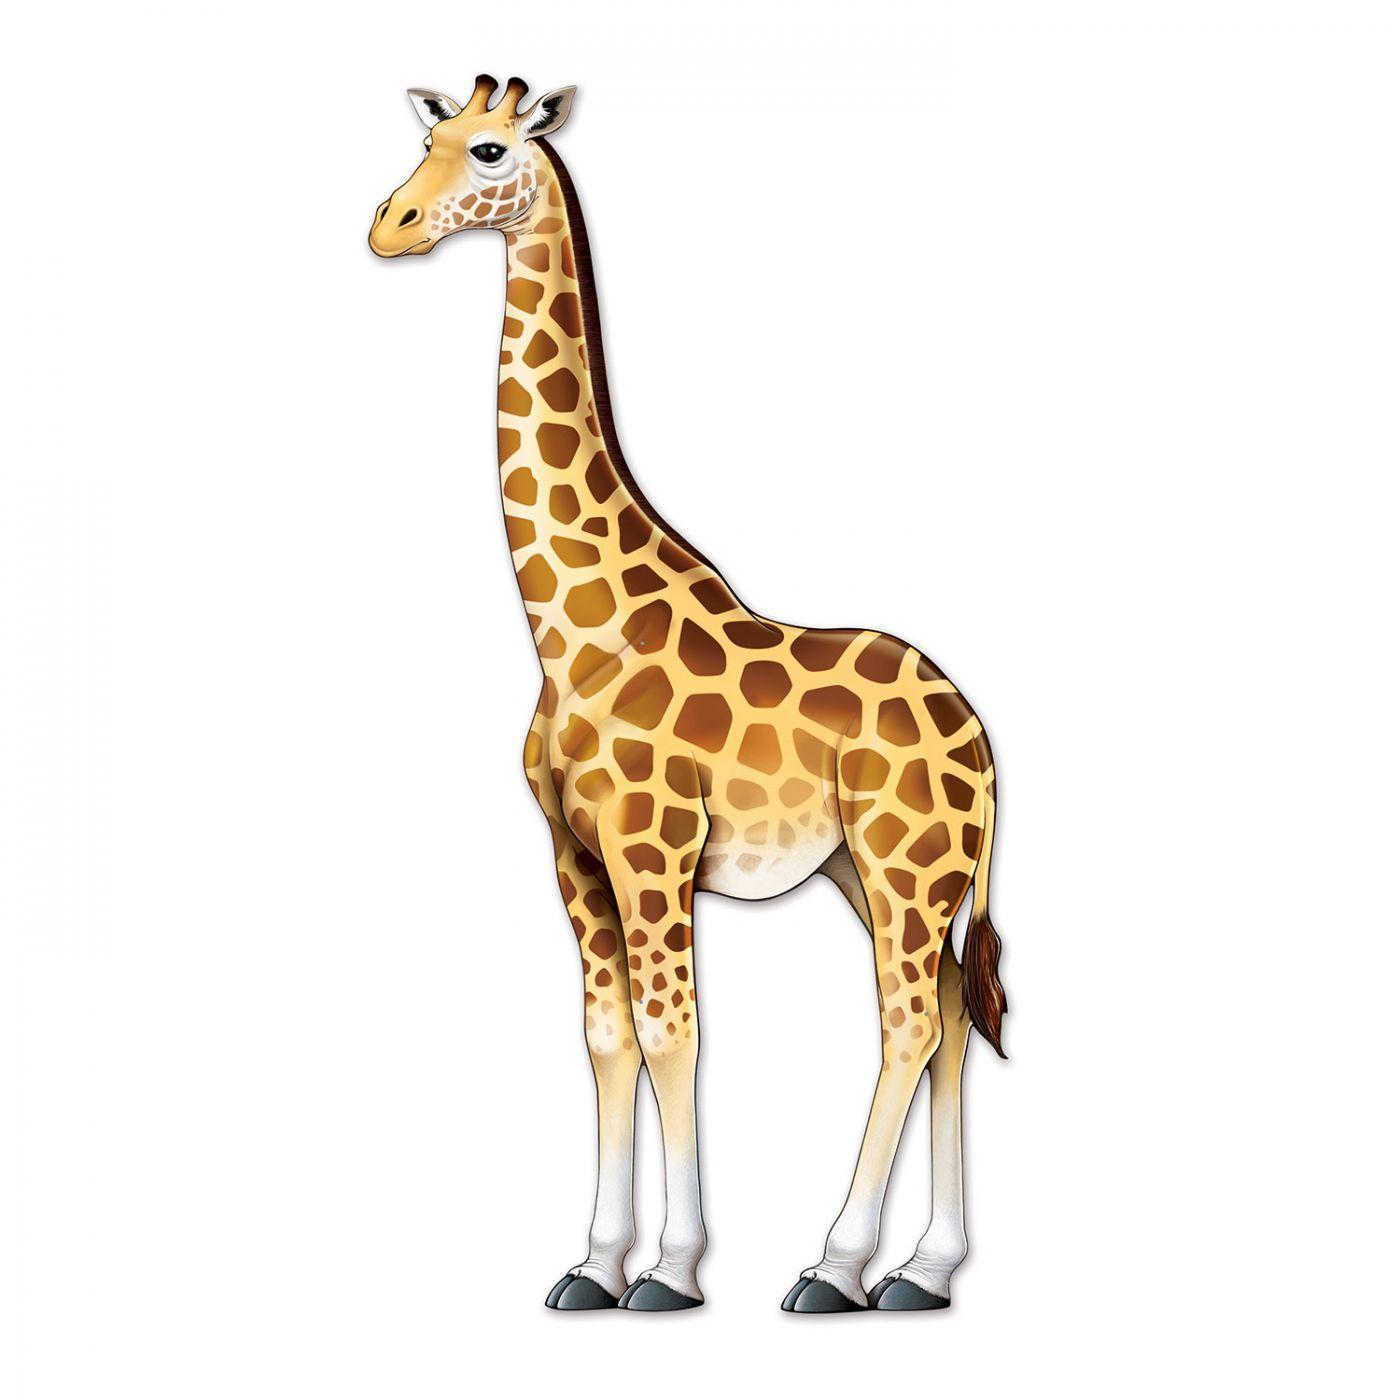 Jointed Giraffe image